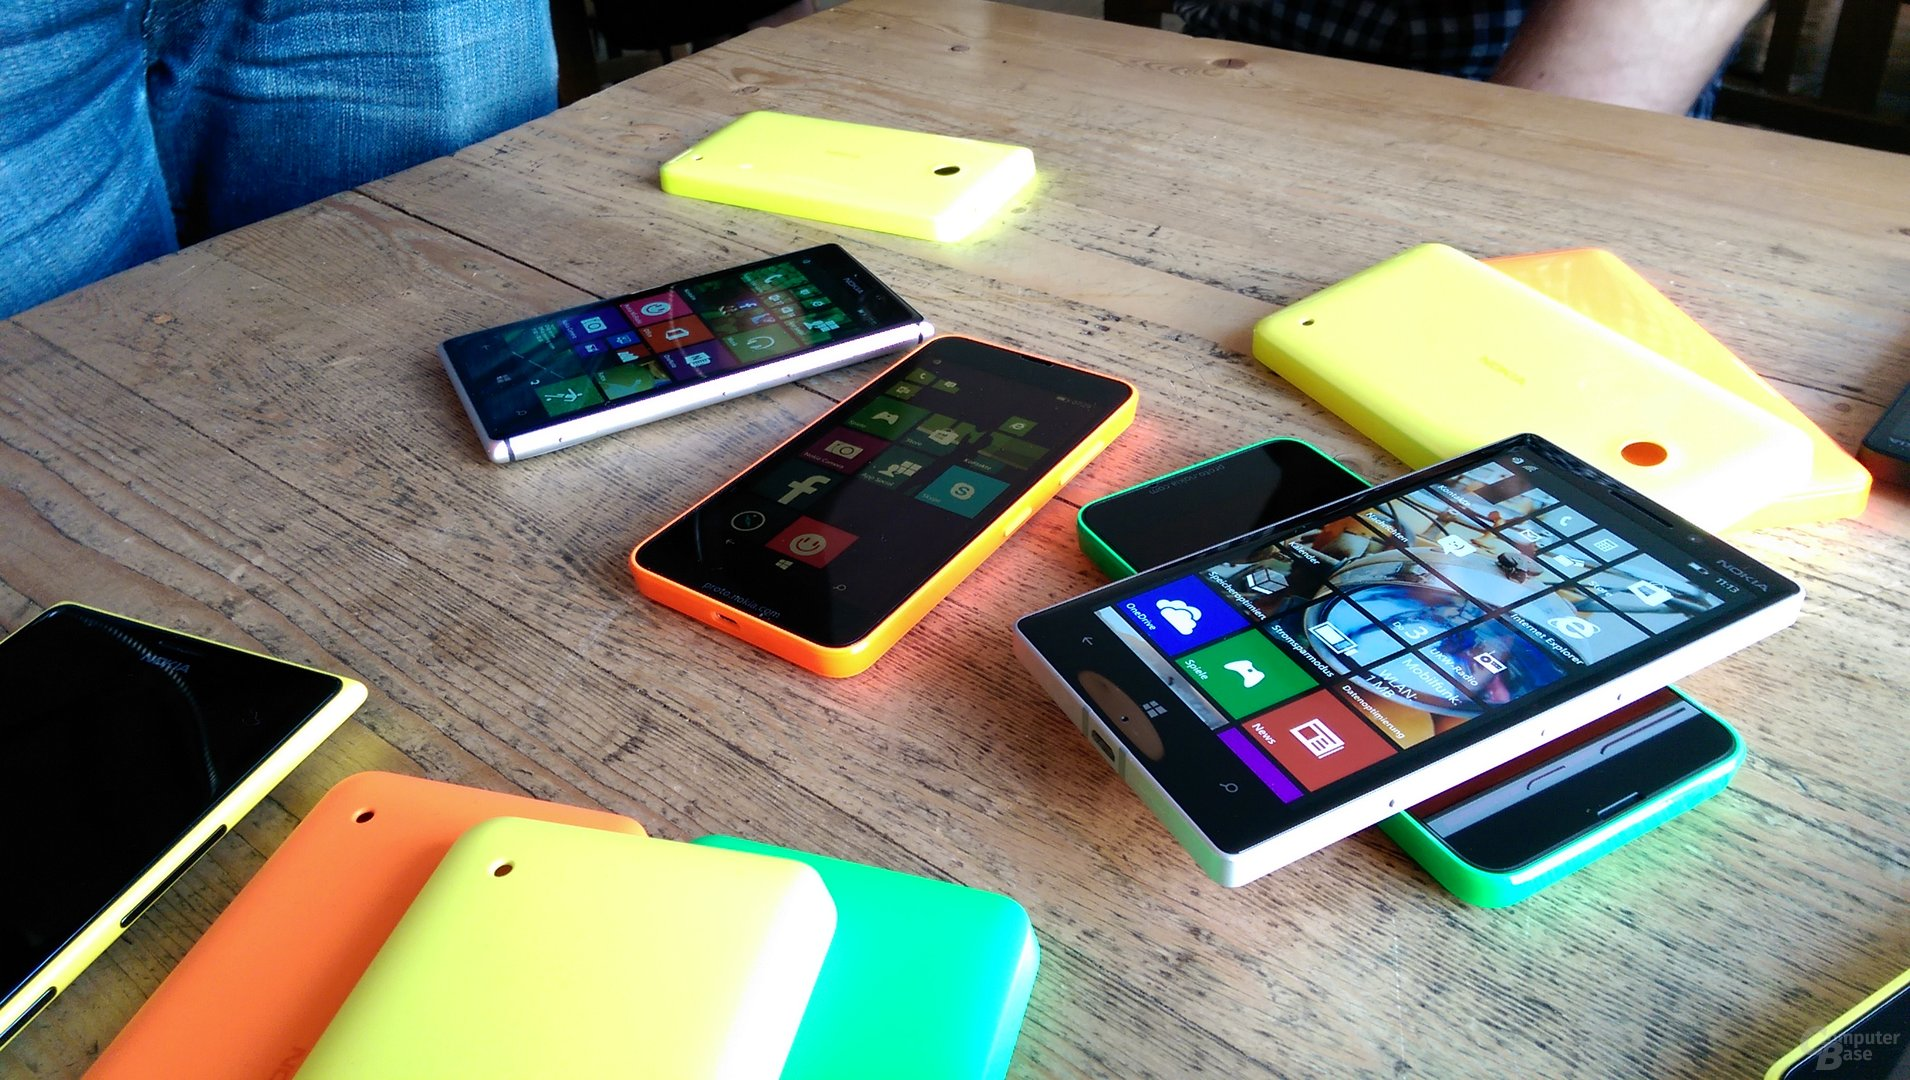 Lumia 930 auf Lumia 635 mit Lumia 925 und Lumia 635 im Hintergrund